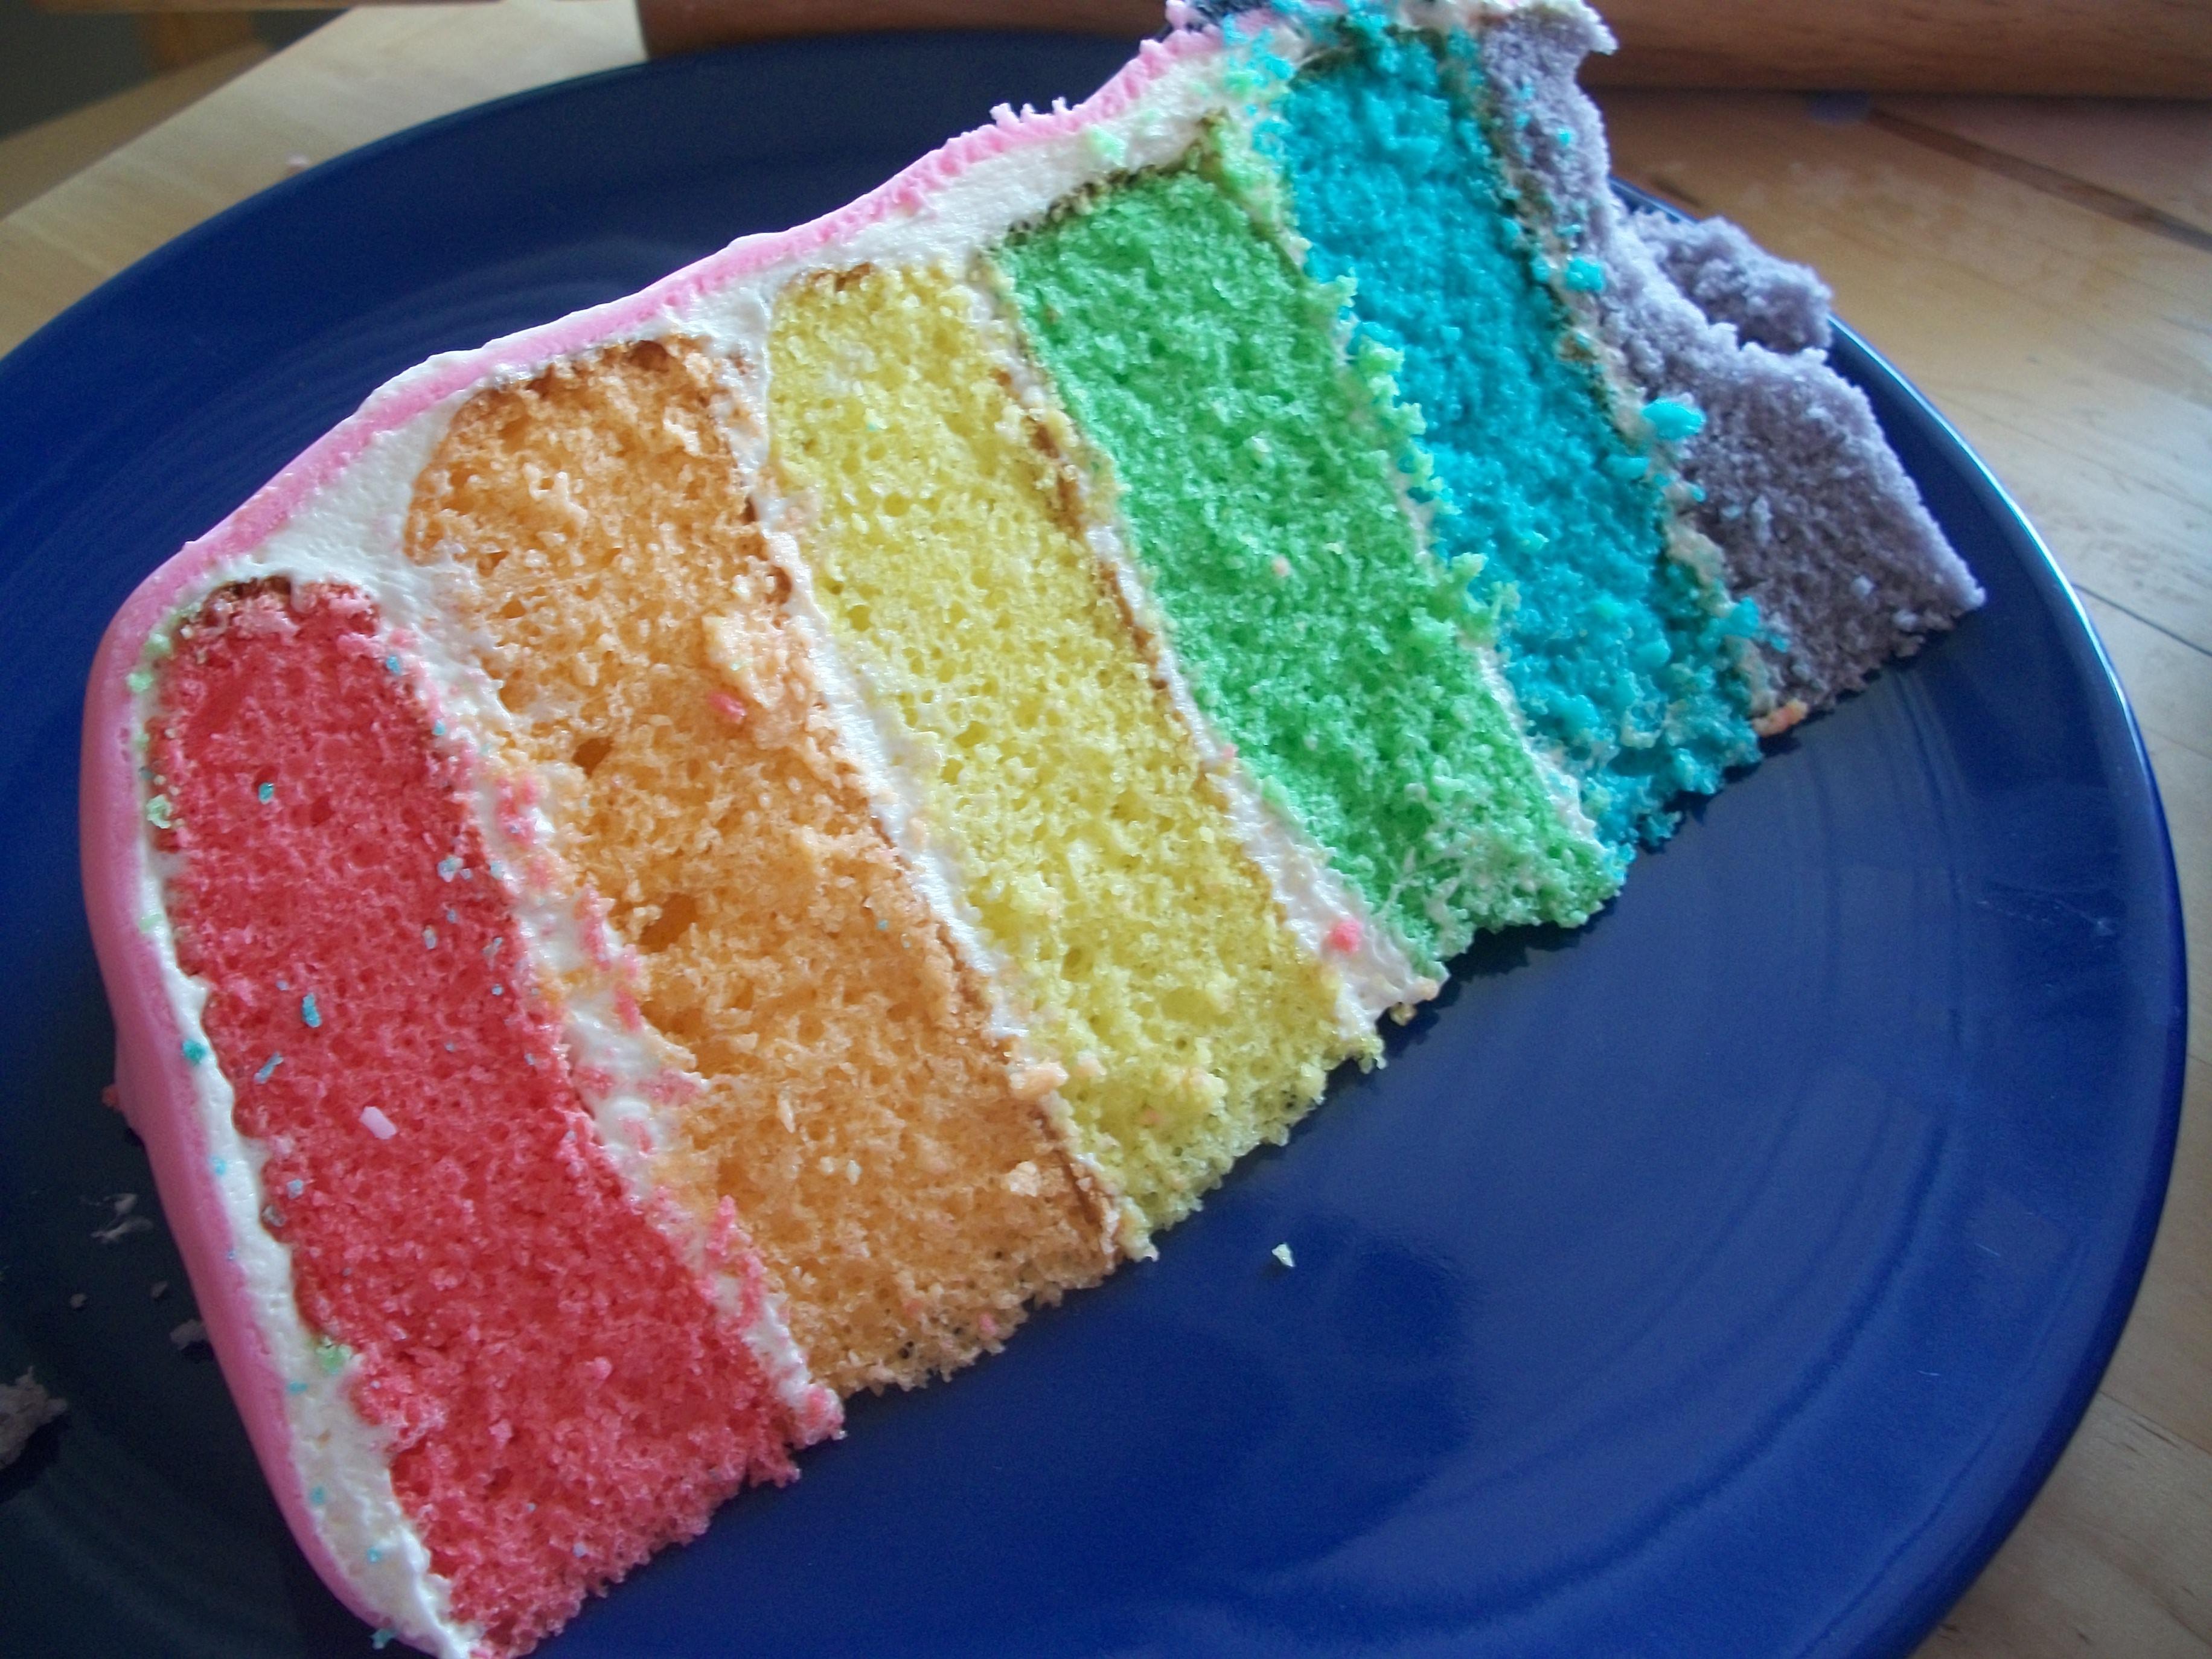 Resep Rainbow Cake Ncc Fatmah Bahalwan: RAINBOW CAKE RESEP NCC